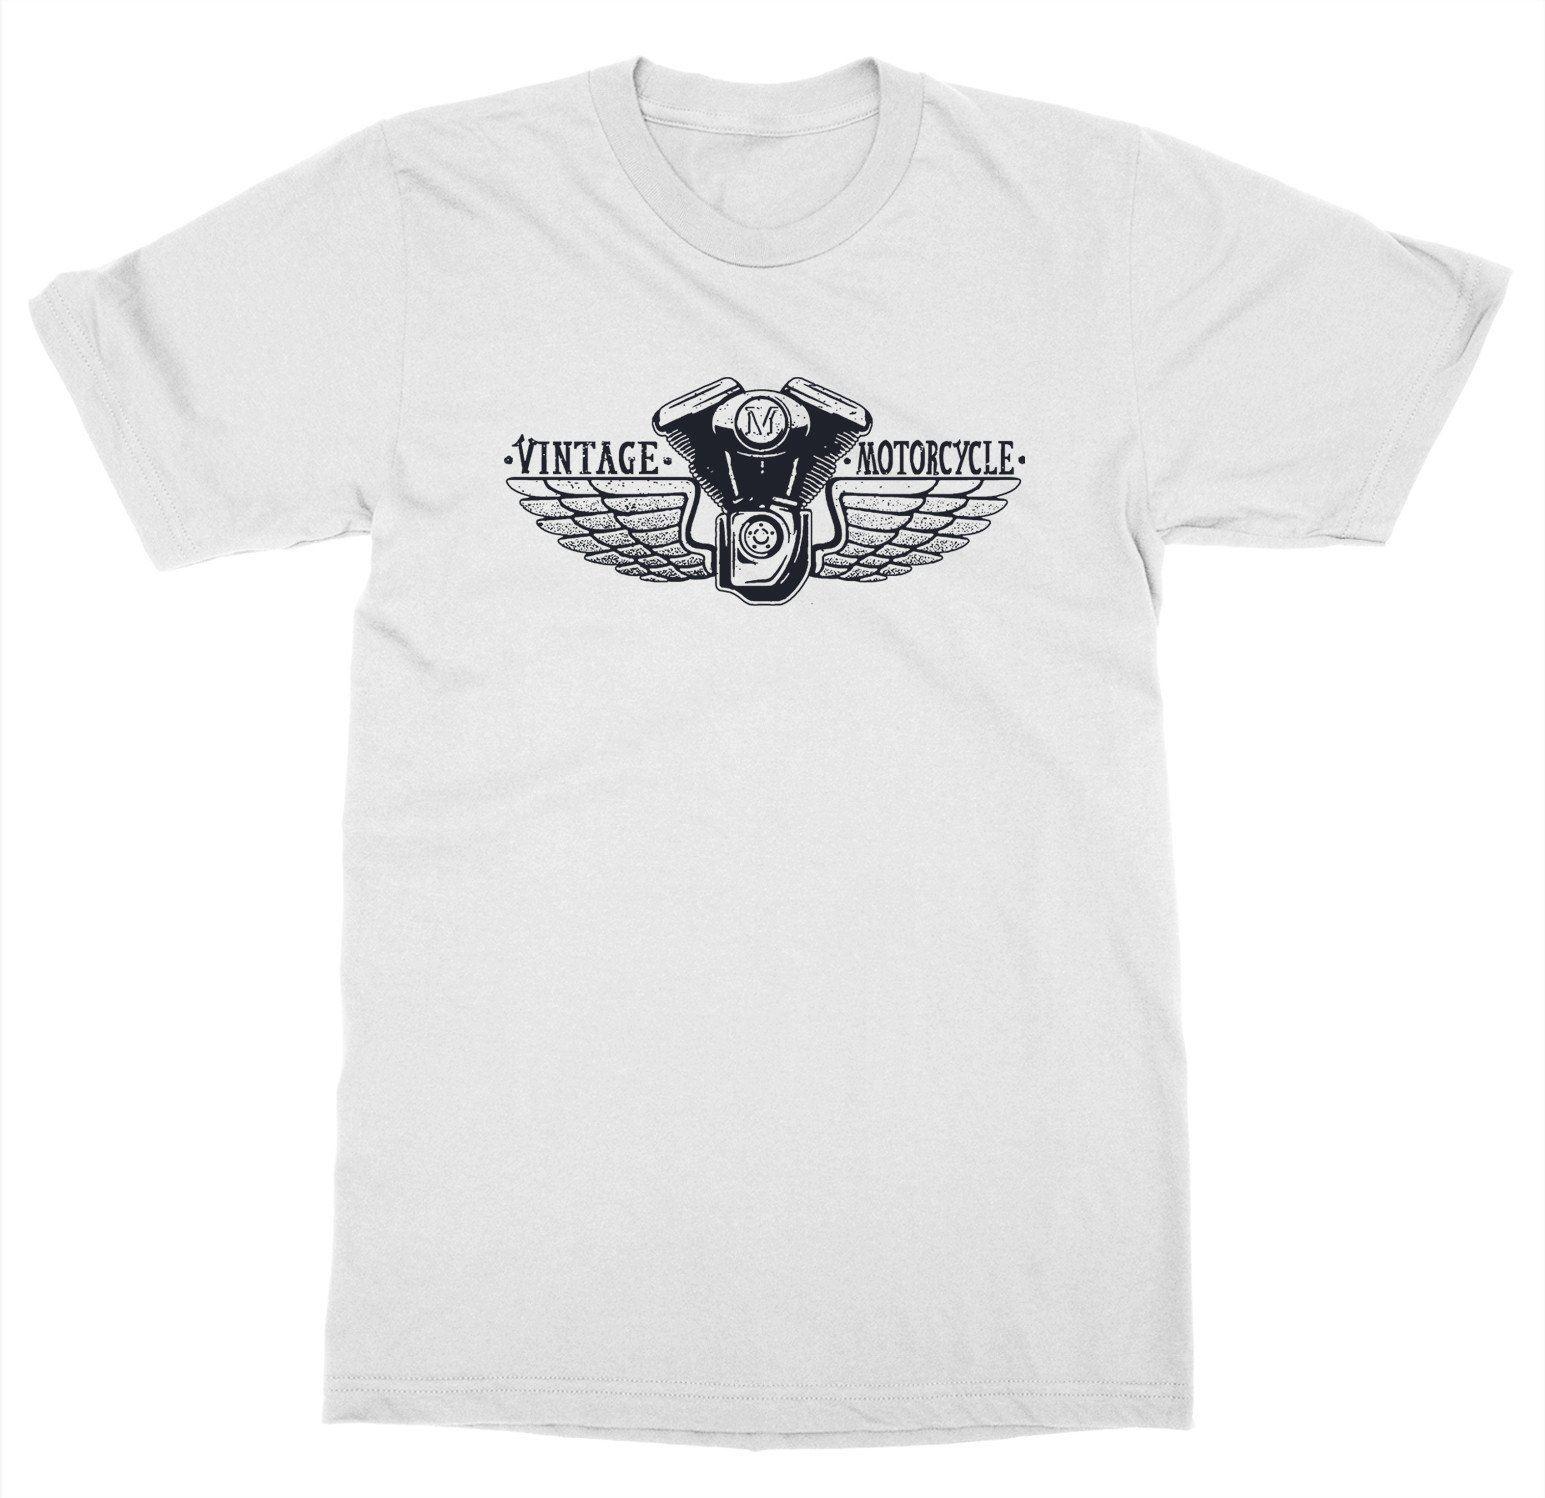 Shirt Funny T-Shirt Men Vintage Motorcycle Wings T-Shirt Ride or Die Club Gear Race Biker Shop Live Fastcustom Tee Shirts